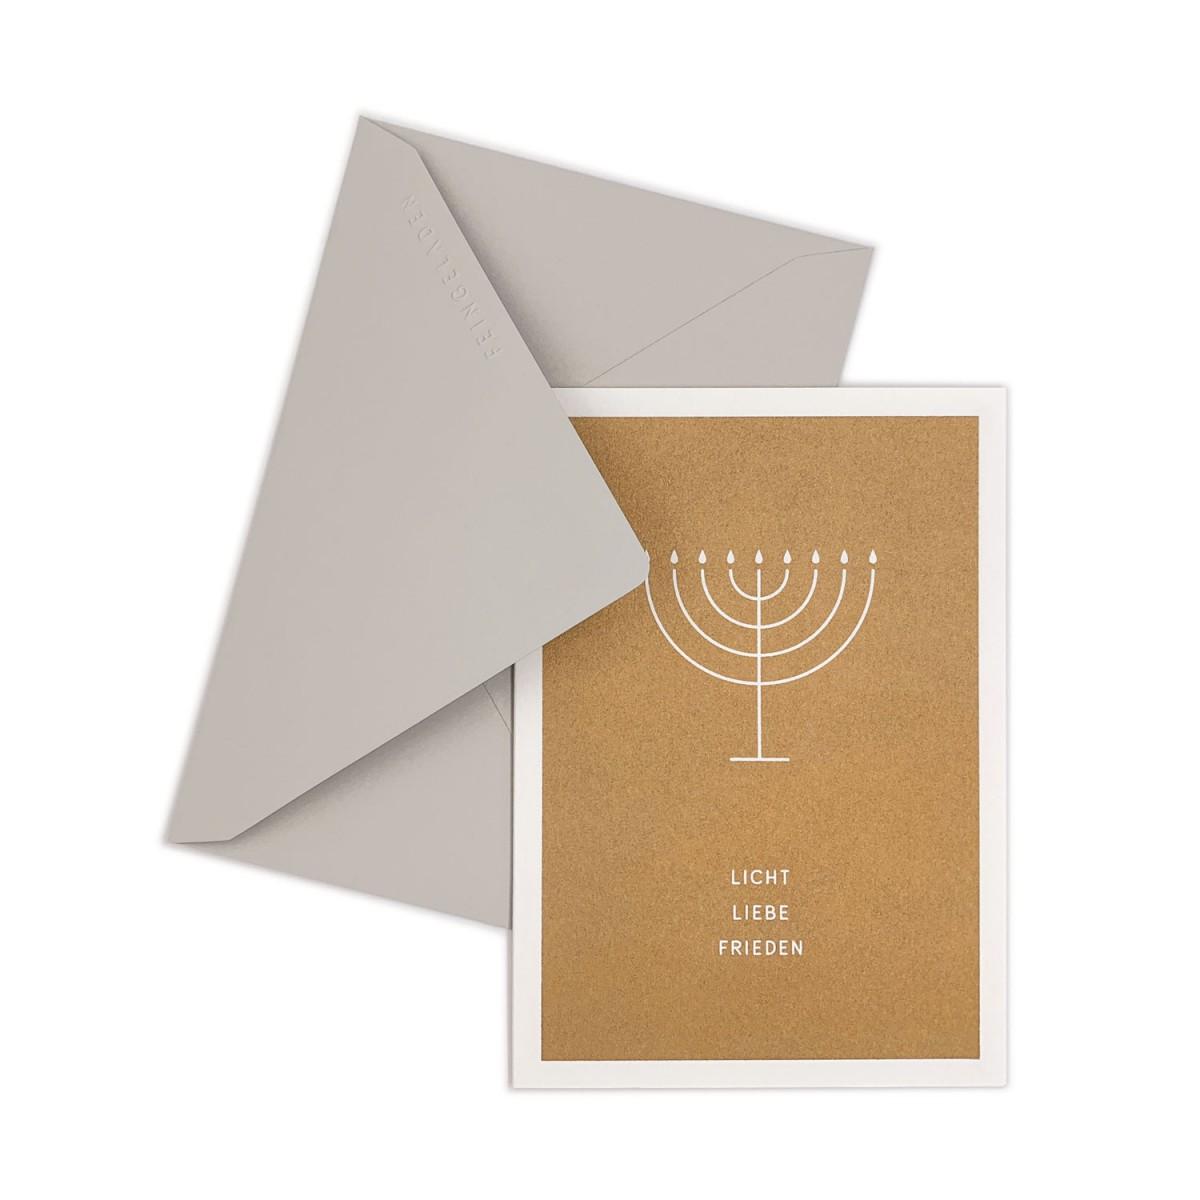 Feingeladen // SIMPLY DIVINE // Hanukkah »Licht Liebe Frieden« (GD) // RISO-Klappkarte, A6